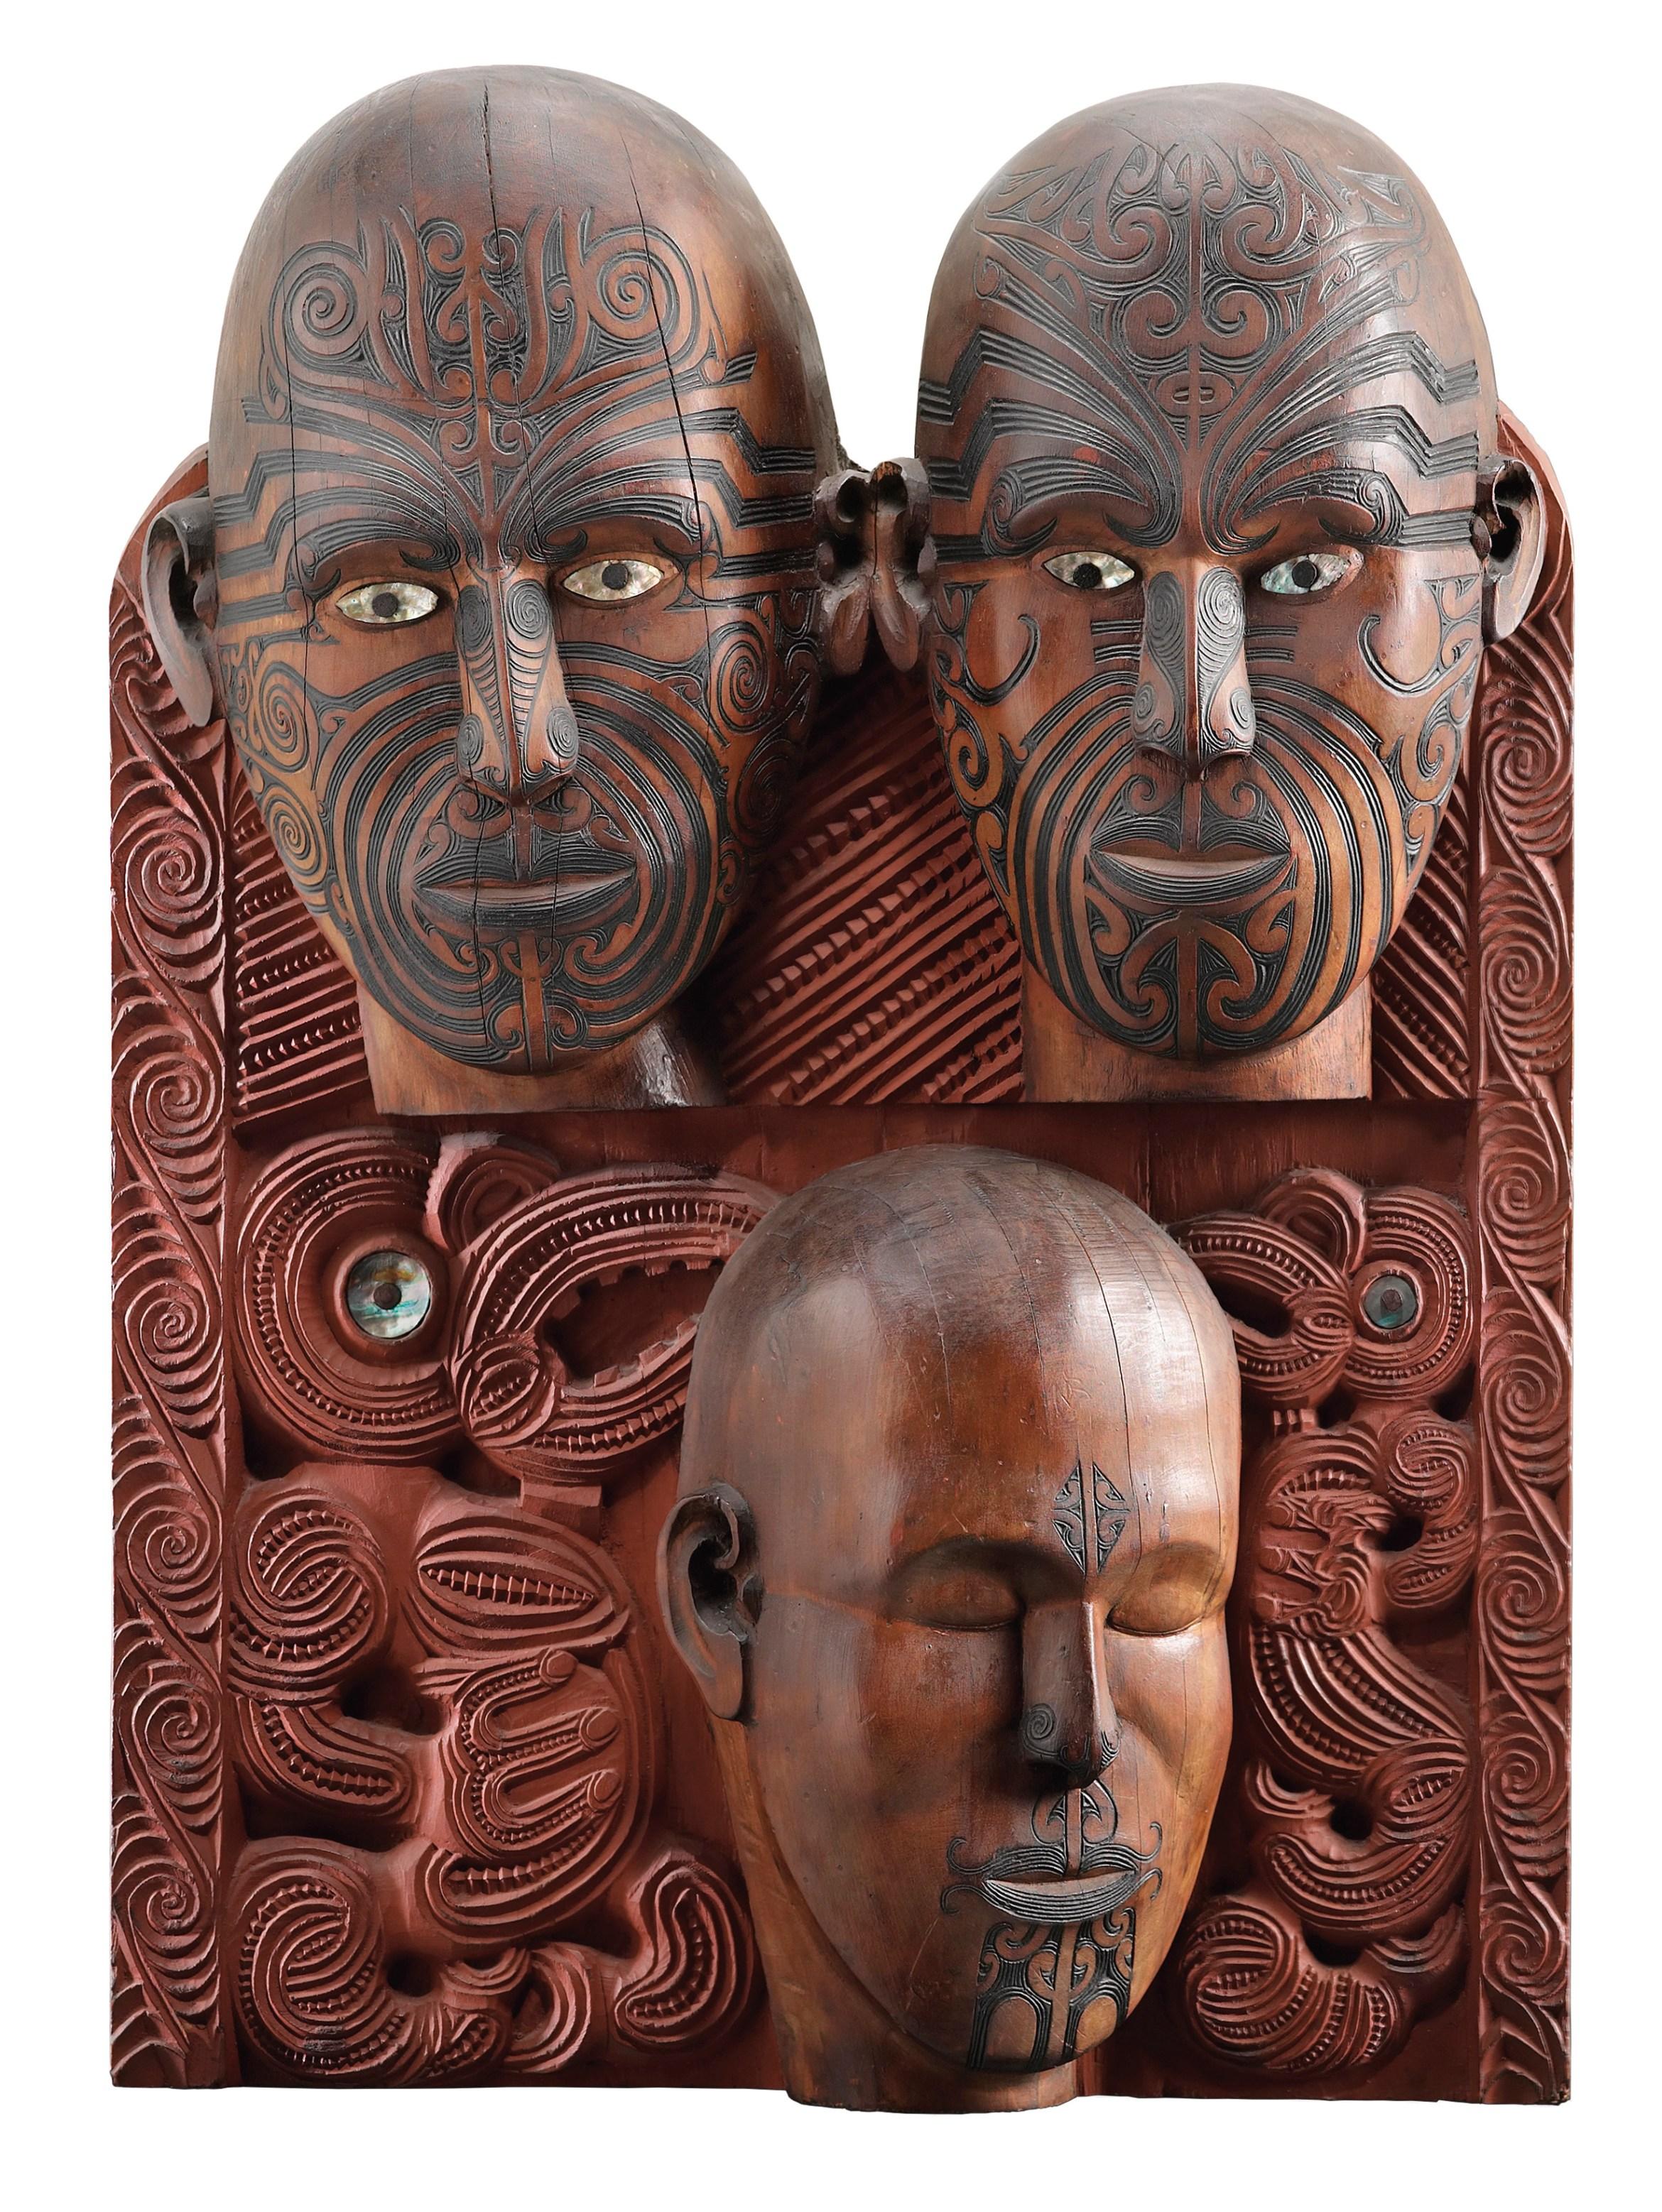 Oceania_Tene Waitere, Ta Moko panel, 1896-99